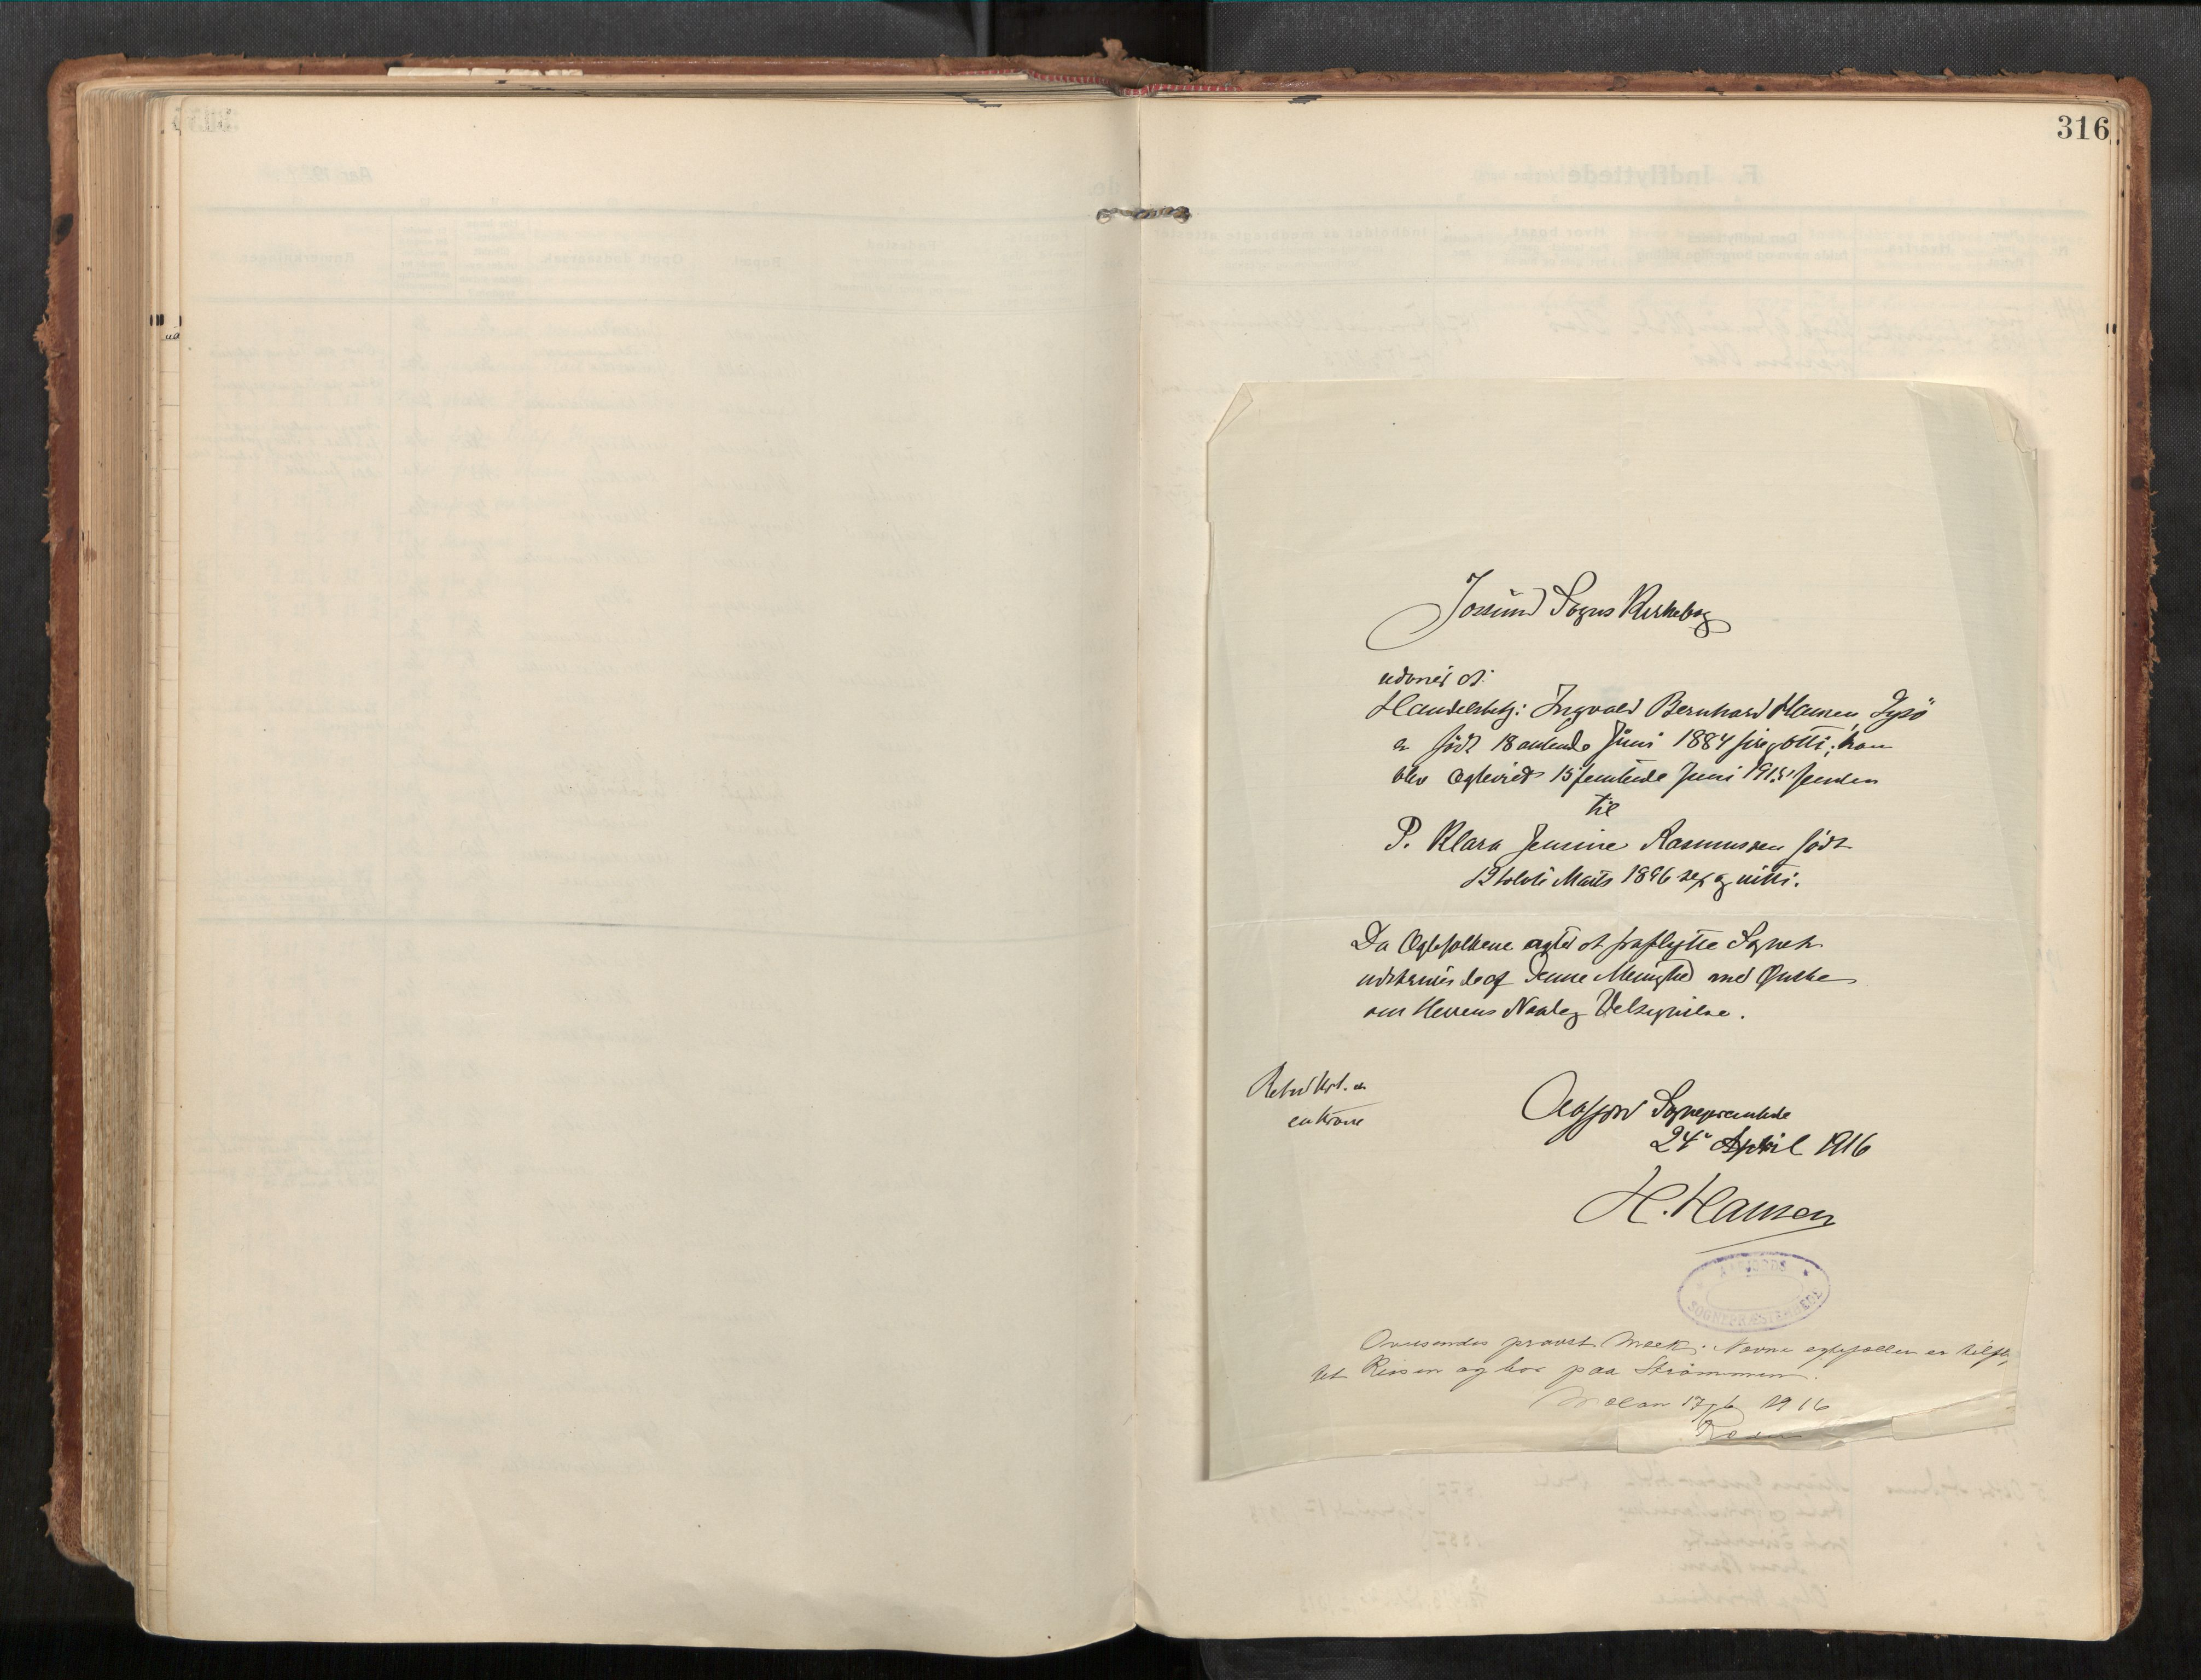 SAT, Stadsbygd sokneprestkontor, I/I1/I1a/L0001: Ministerialbok nr. 1, 1911-1929